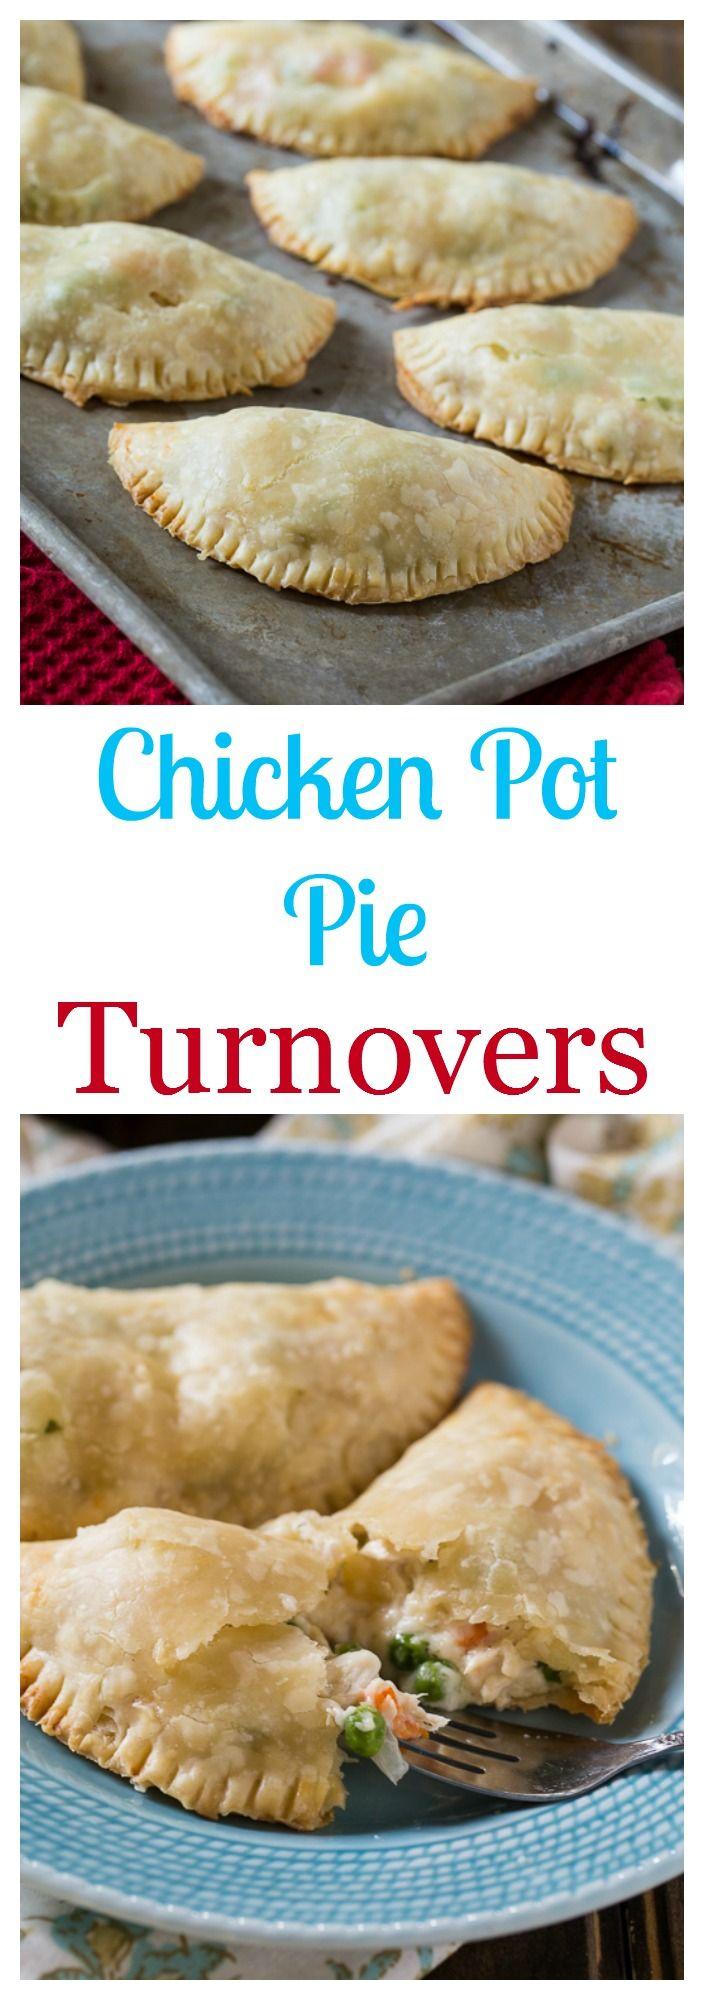 Food Nostalgia 40 Popular 80 S Recipes Frugal Sos